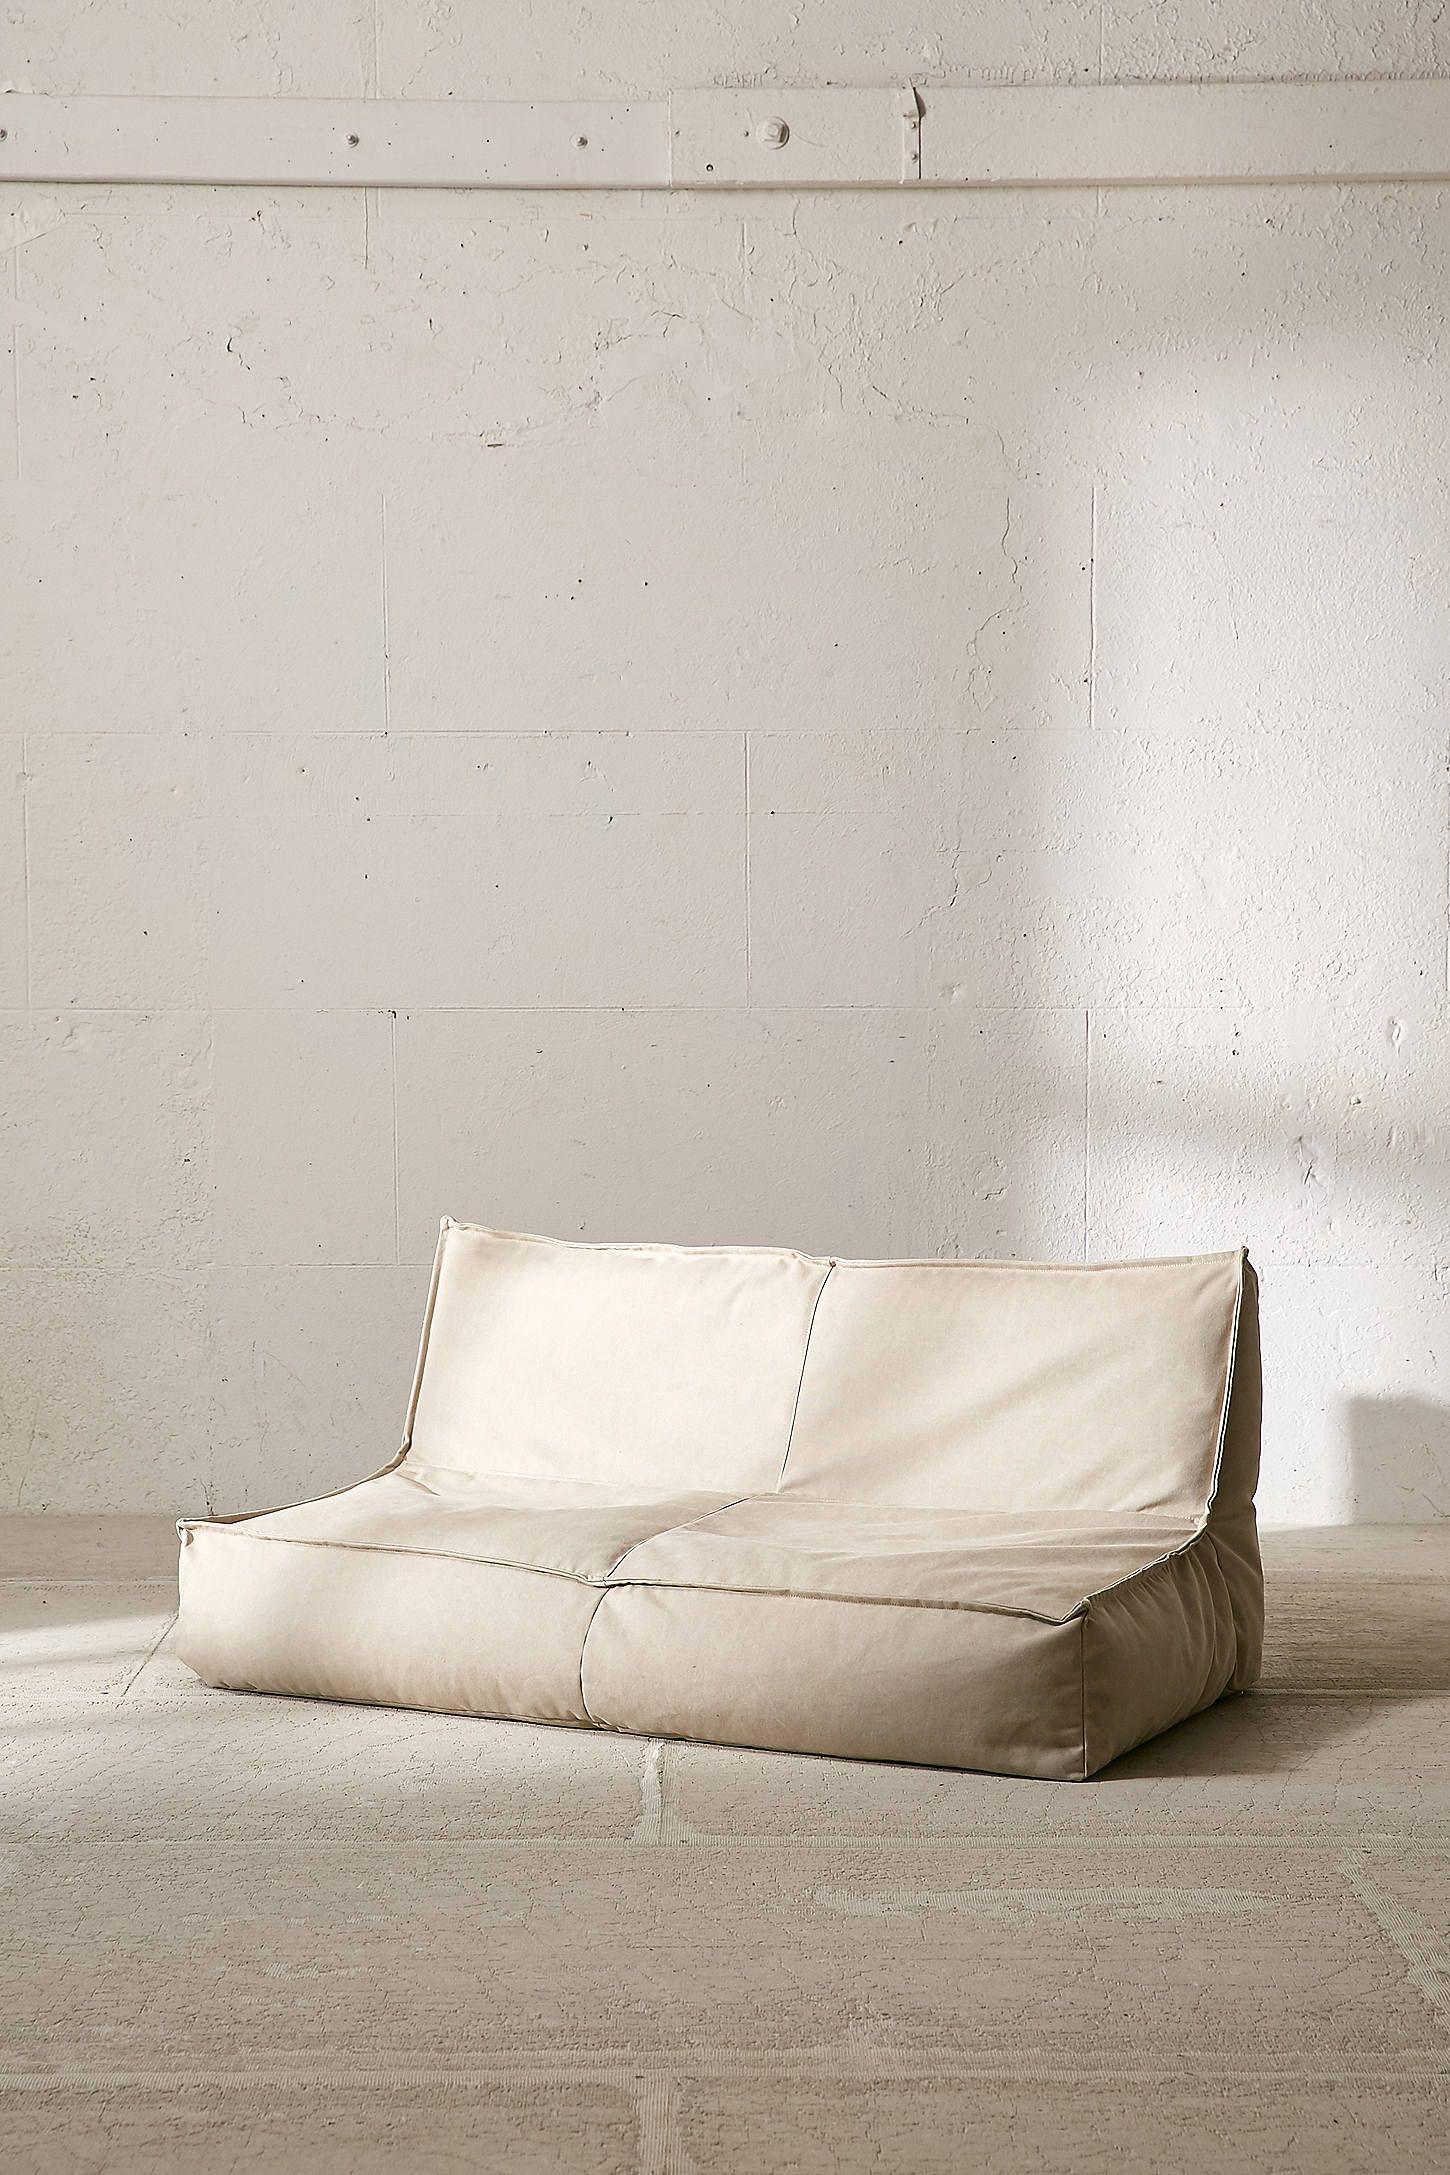 Peachy Lennon Loveseat Sofa Floor Seating Loveseat Sofa Sofa Ibusinesslaw Wood Chair Design Ideas Ibusinesslaworg